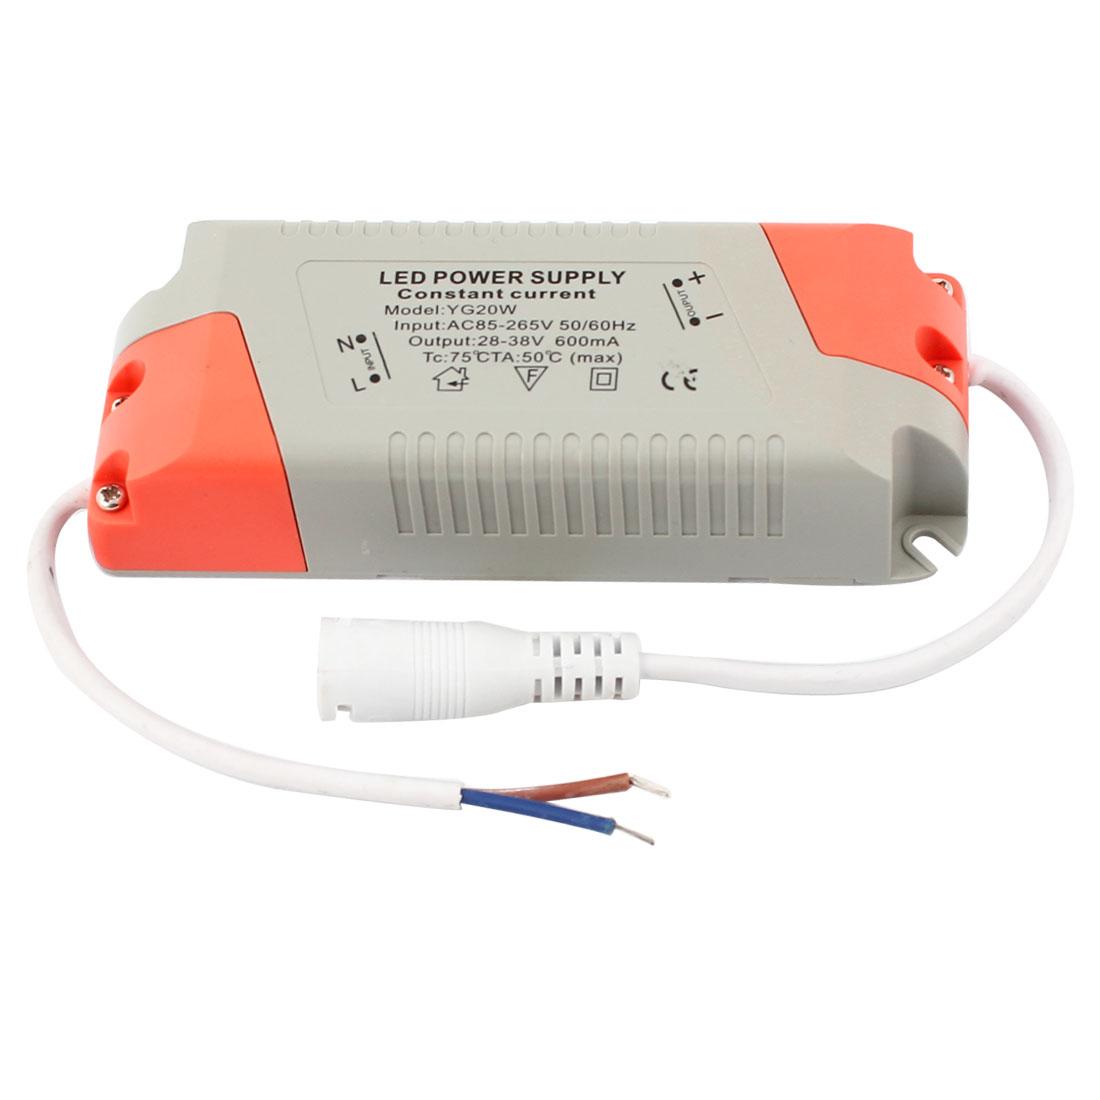 AC 85-265V to DC 28-38V DC 5.5x2.1mm Female 20W LED Light Power Supply